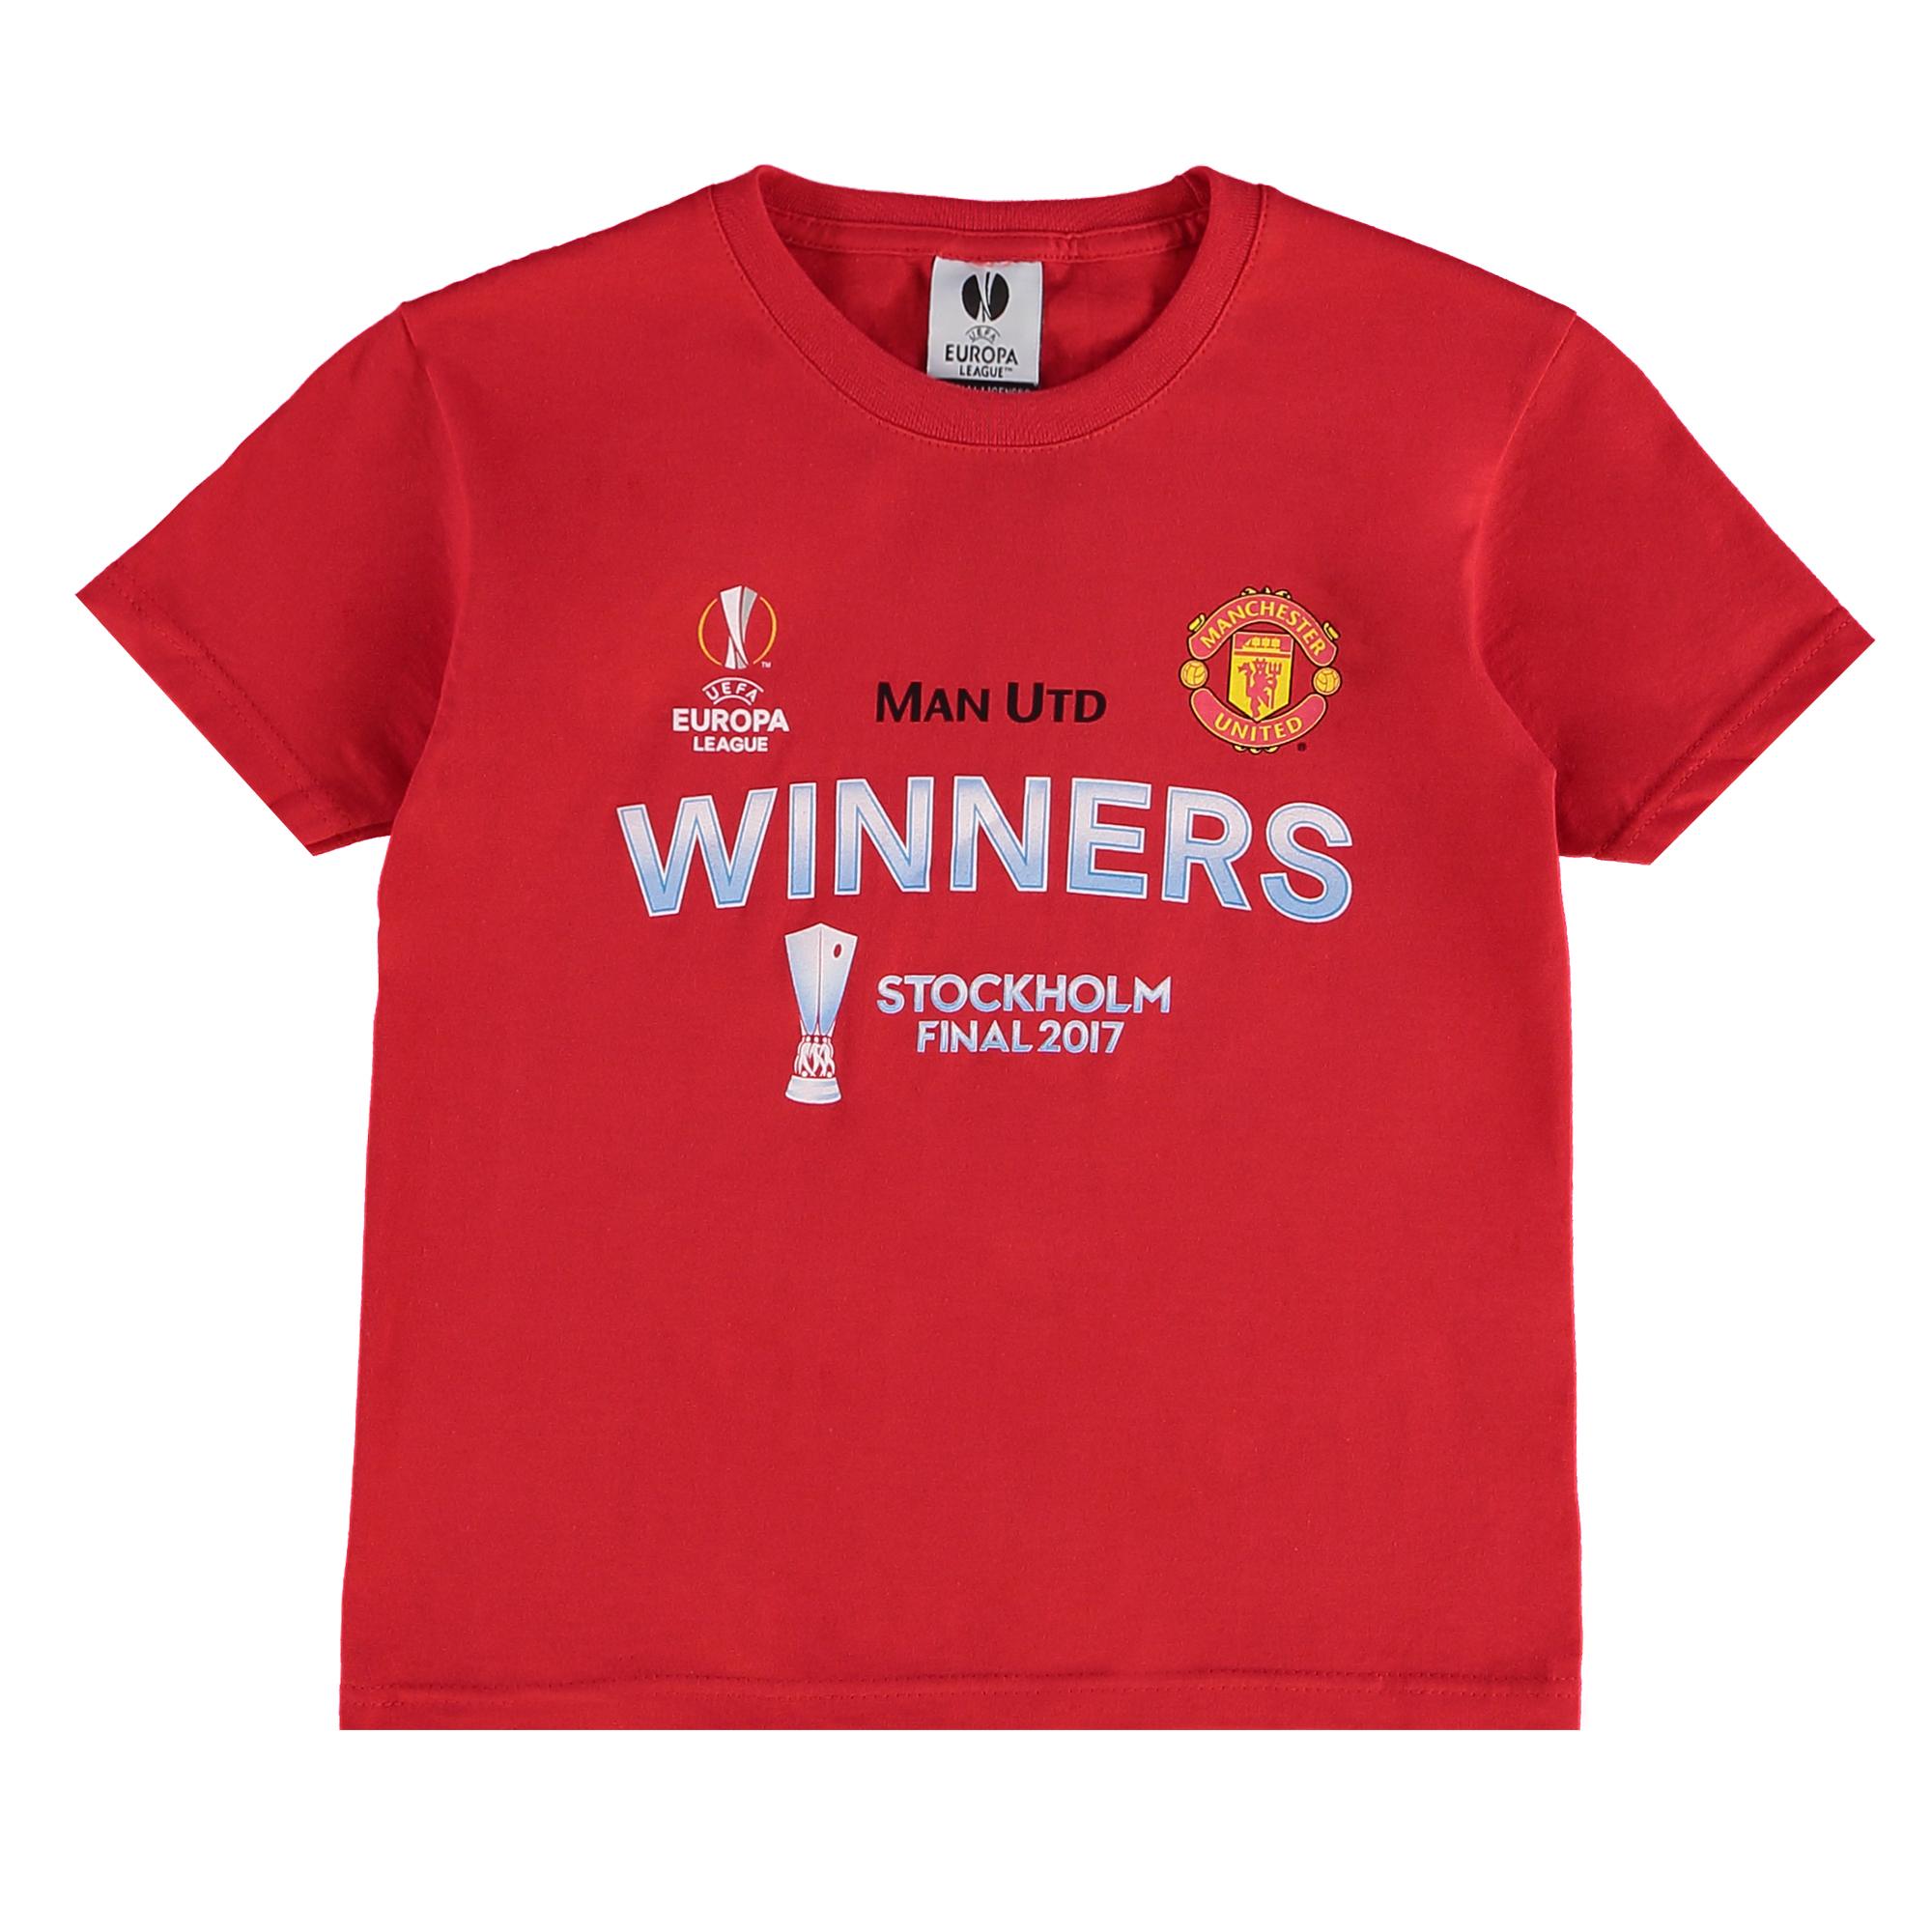 Manchester United Europa League 2017 Winners T-Shirt - Red - Kids